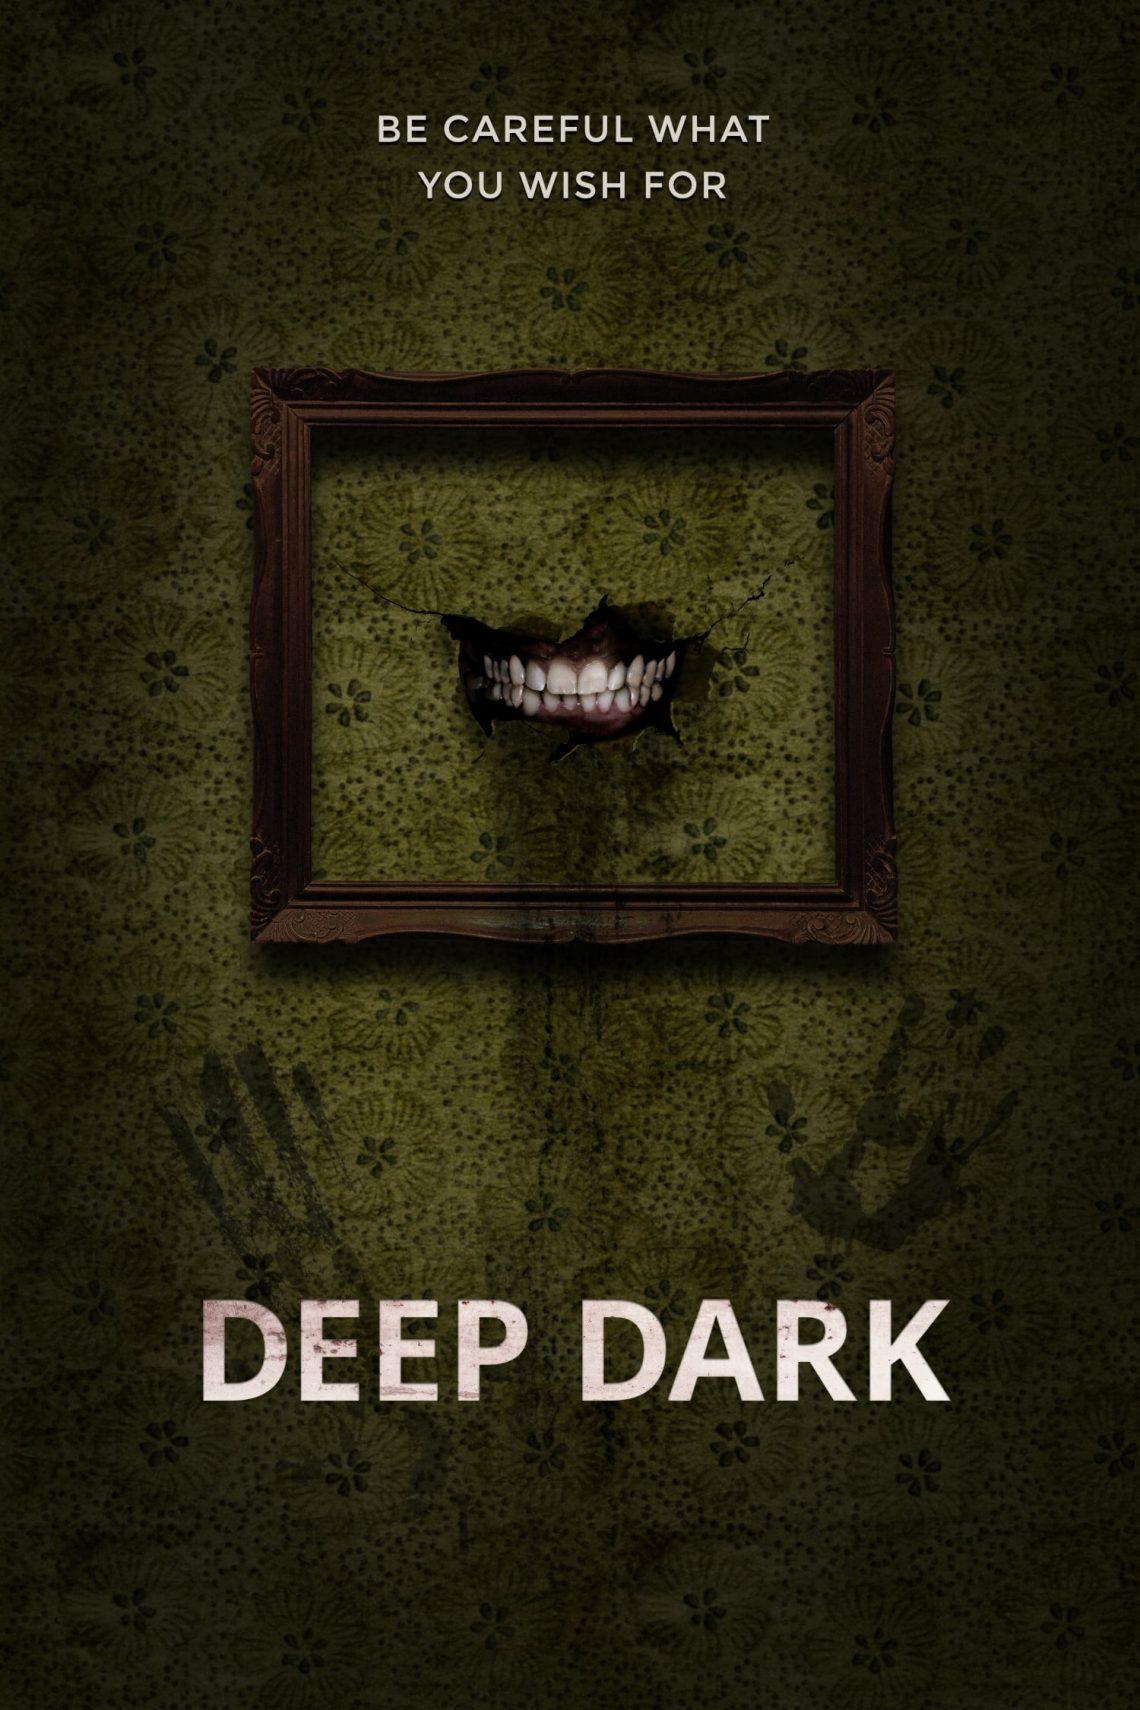 Deep Dark film poster